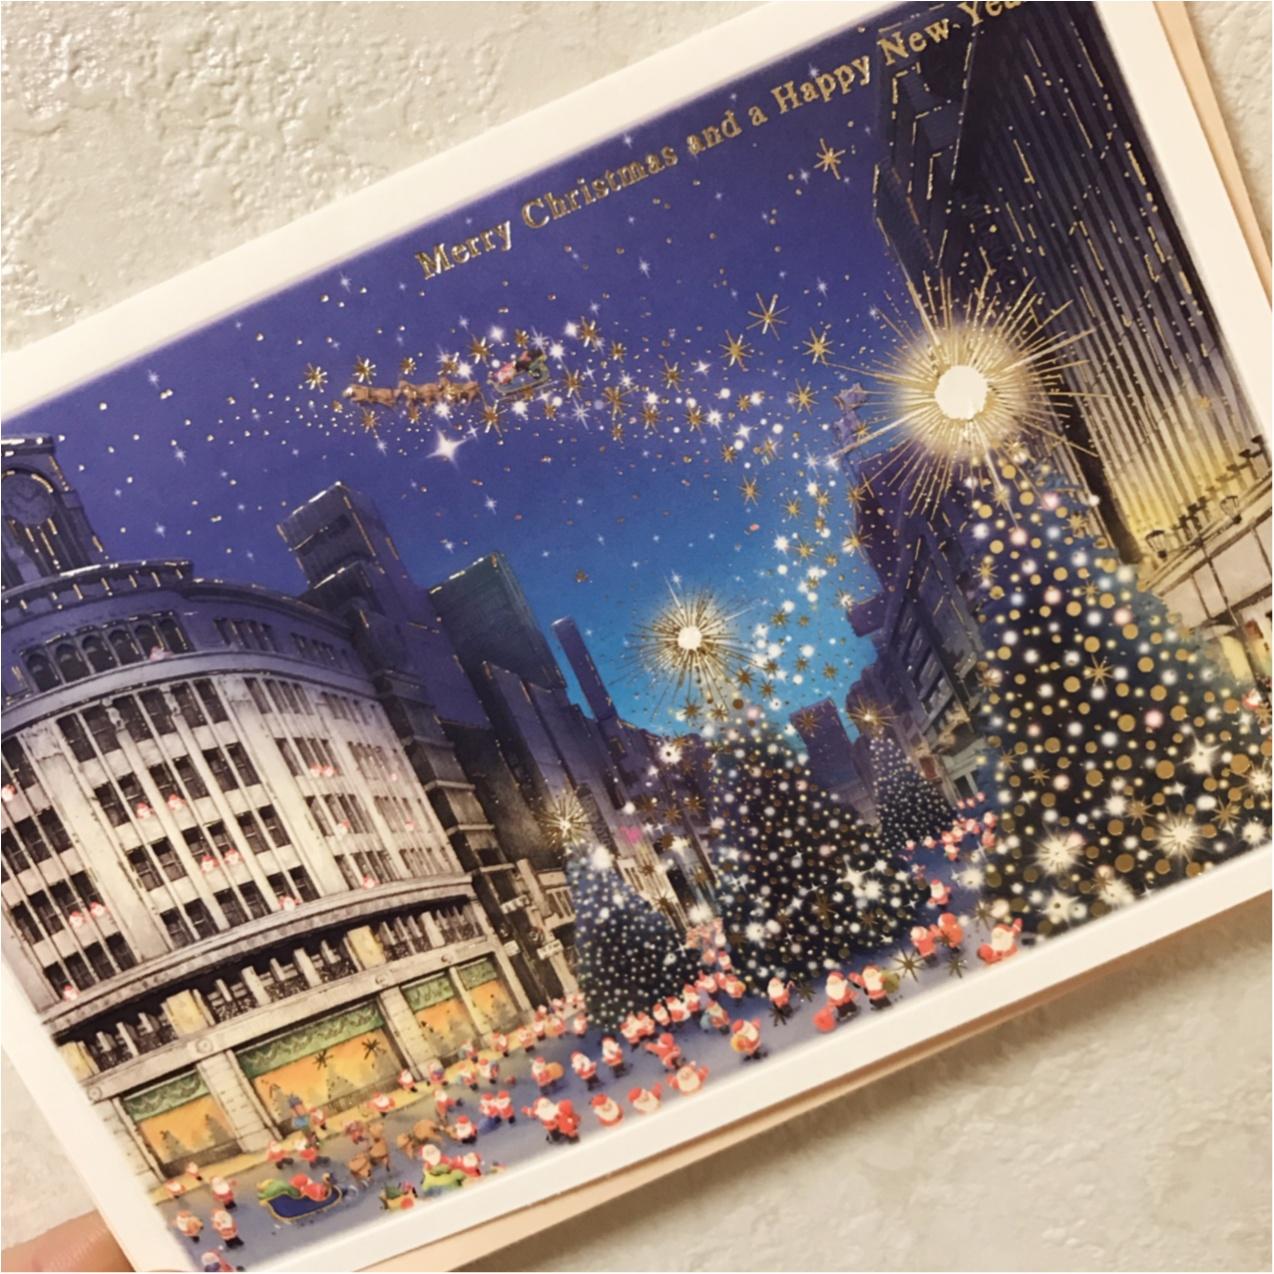 《Xmasプレゼントに添えて♡》 日本を旅するサンタさんが可愛いクリスマスカード❤︎_4